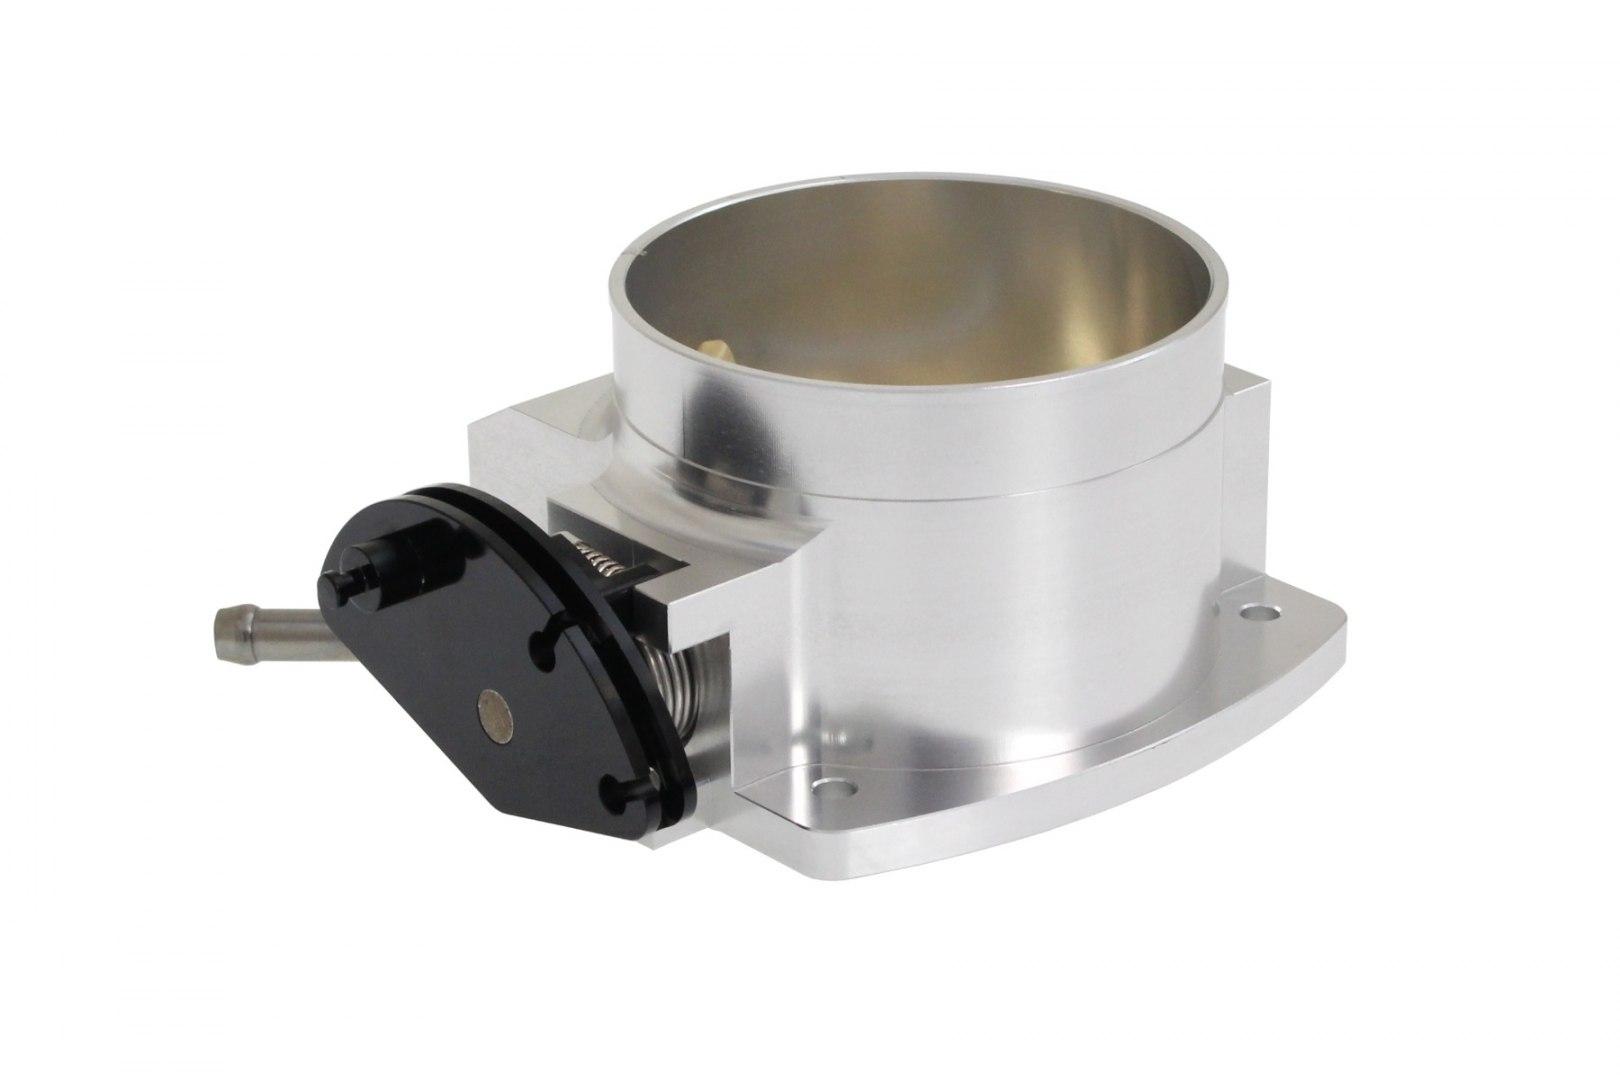 Przepustnica TurboWorks GM LS1/LS2/LS3/LS6/LS7 102mm - GRUBYGARAGE - Sklep Tuningowy